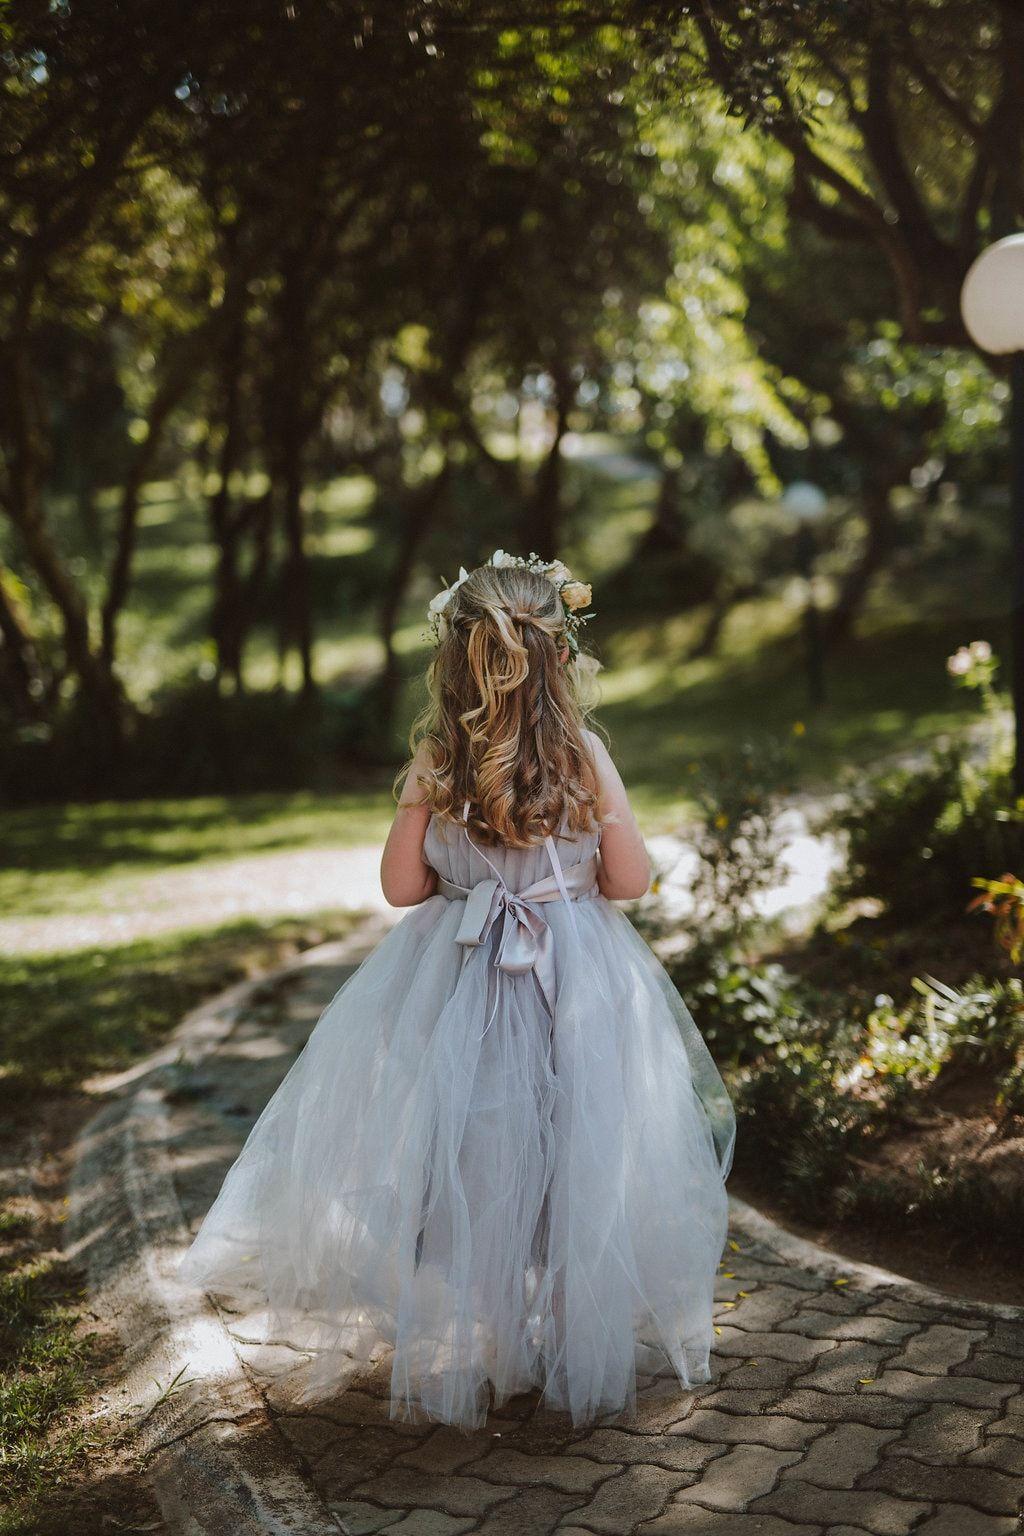 Rustic wedding flower girl dresses  Cute Grey Flower Girl Dress  Image Jessica J Photography  Flower